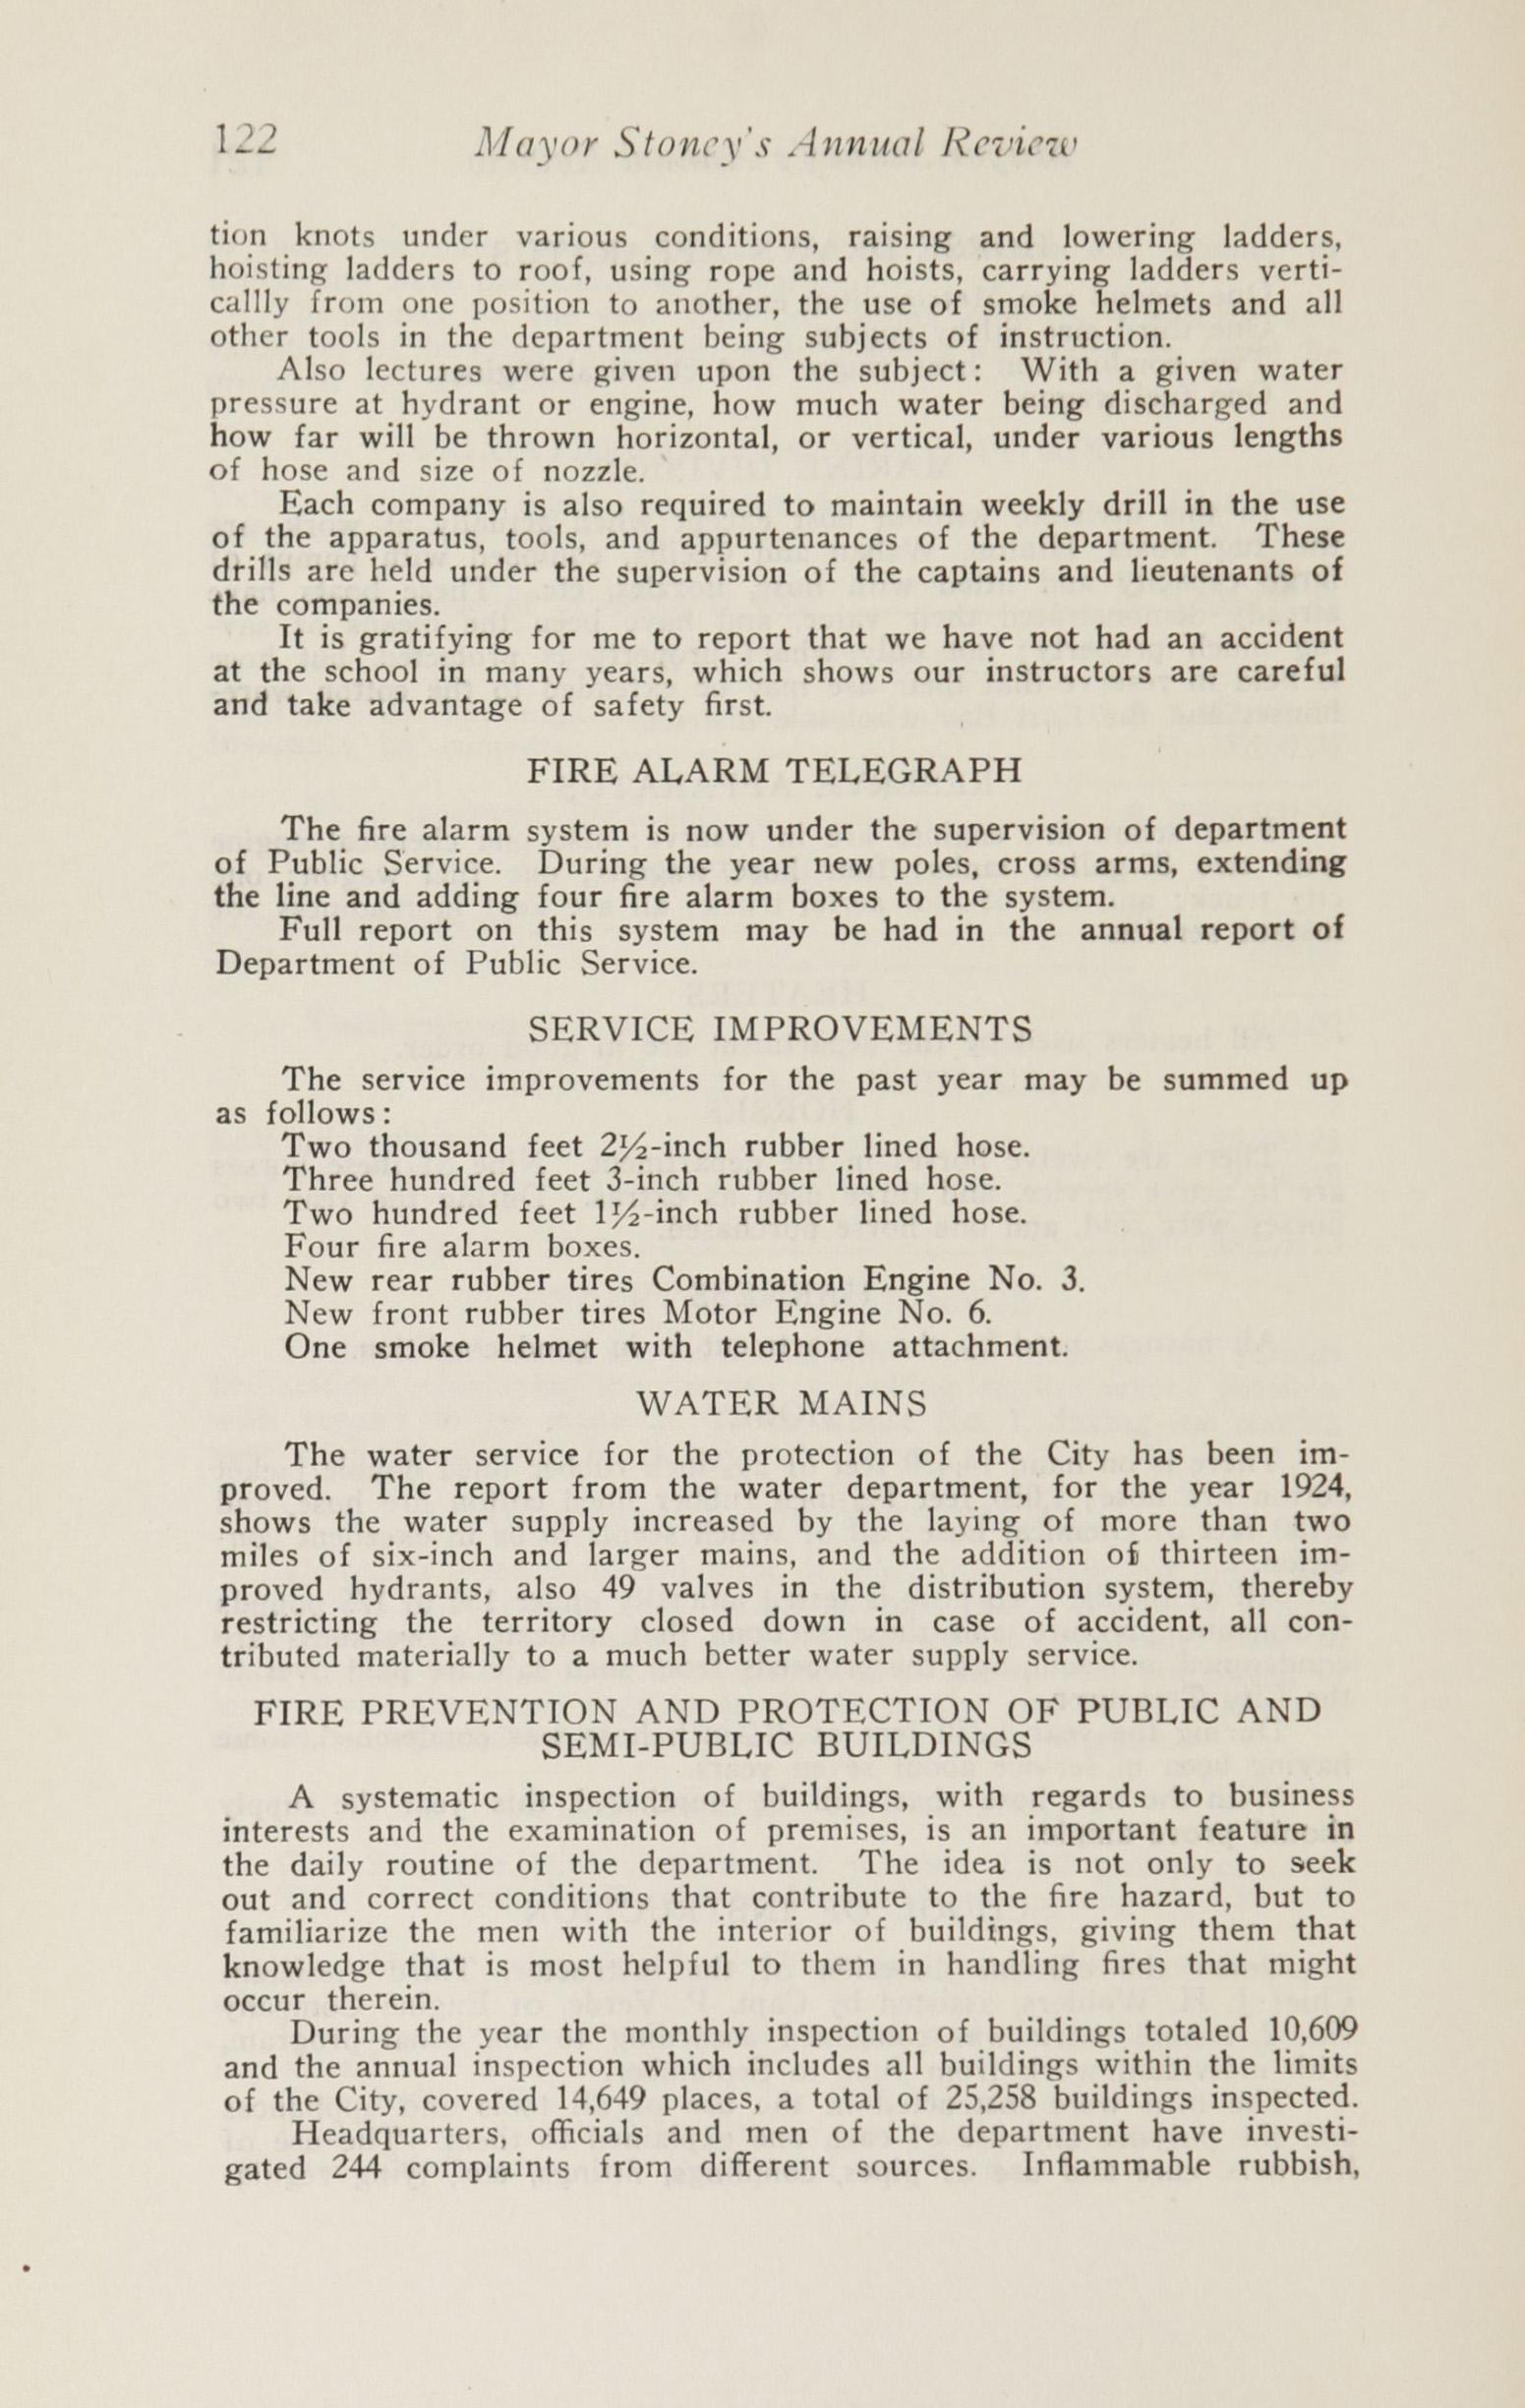 Charleston Yearbook, 1924, page 122